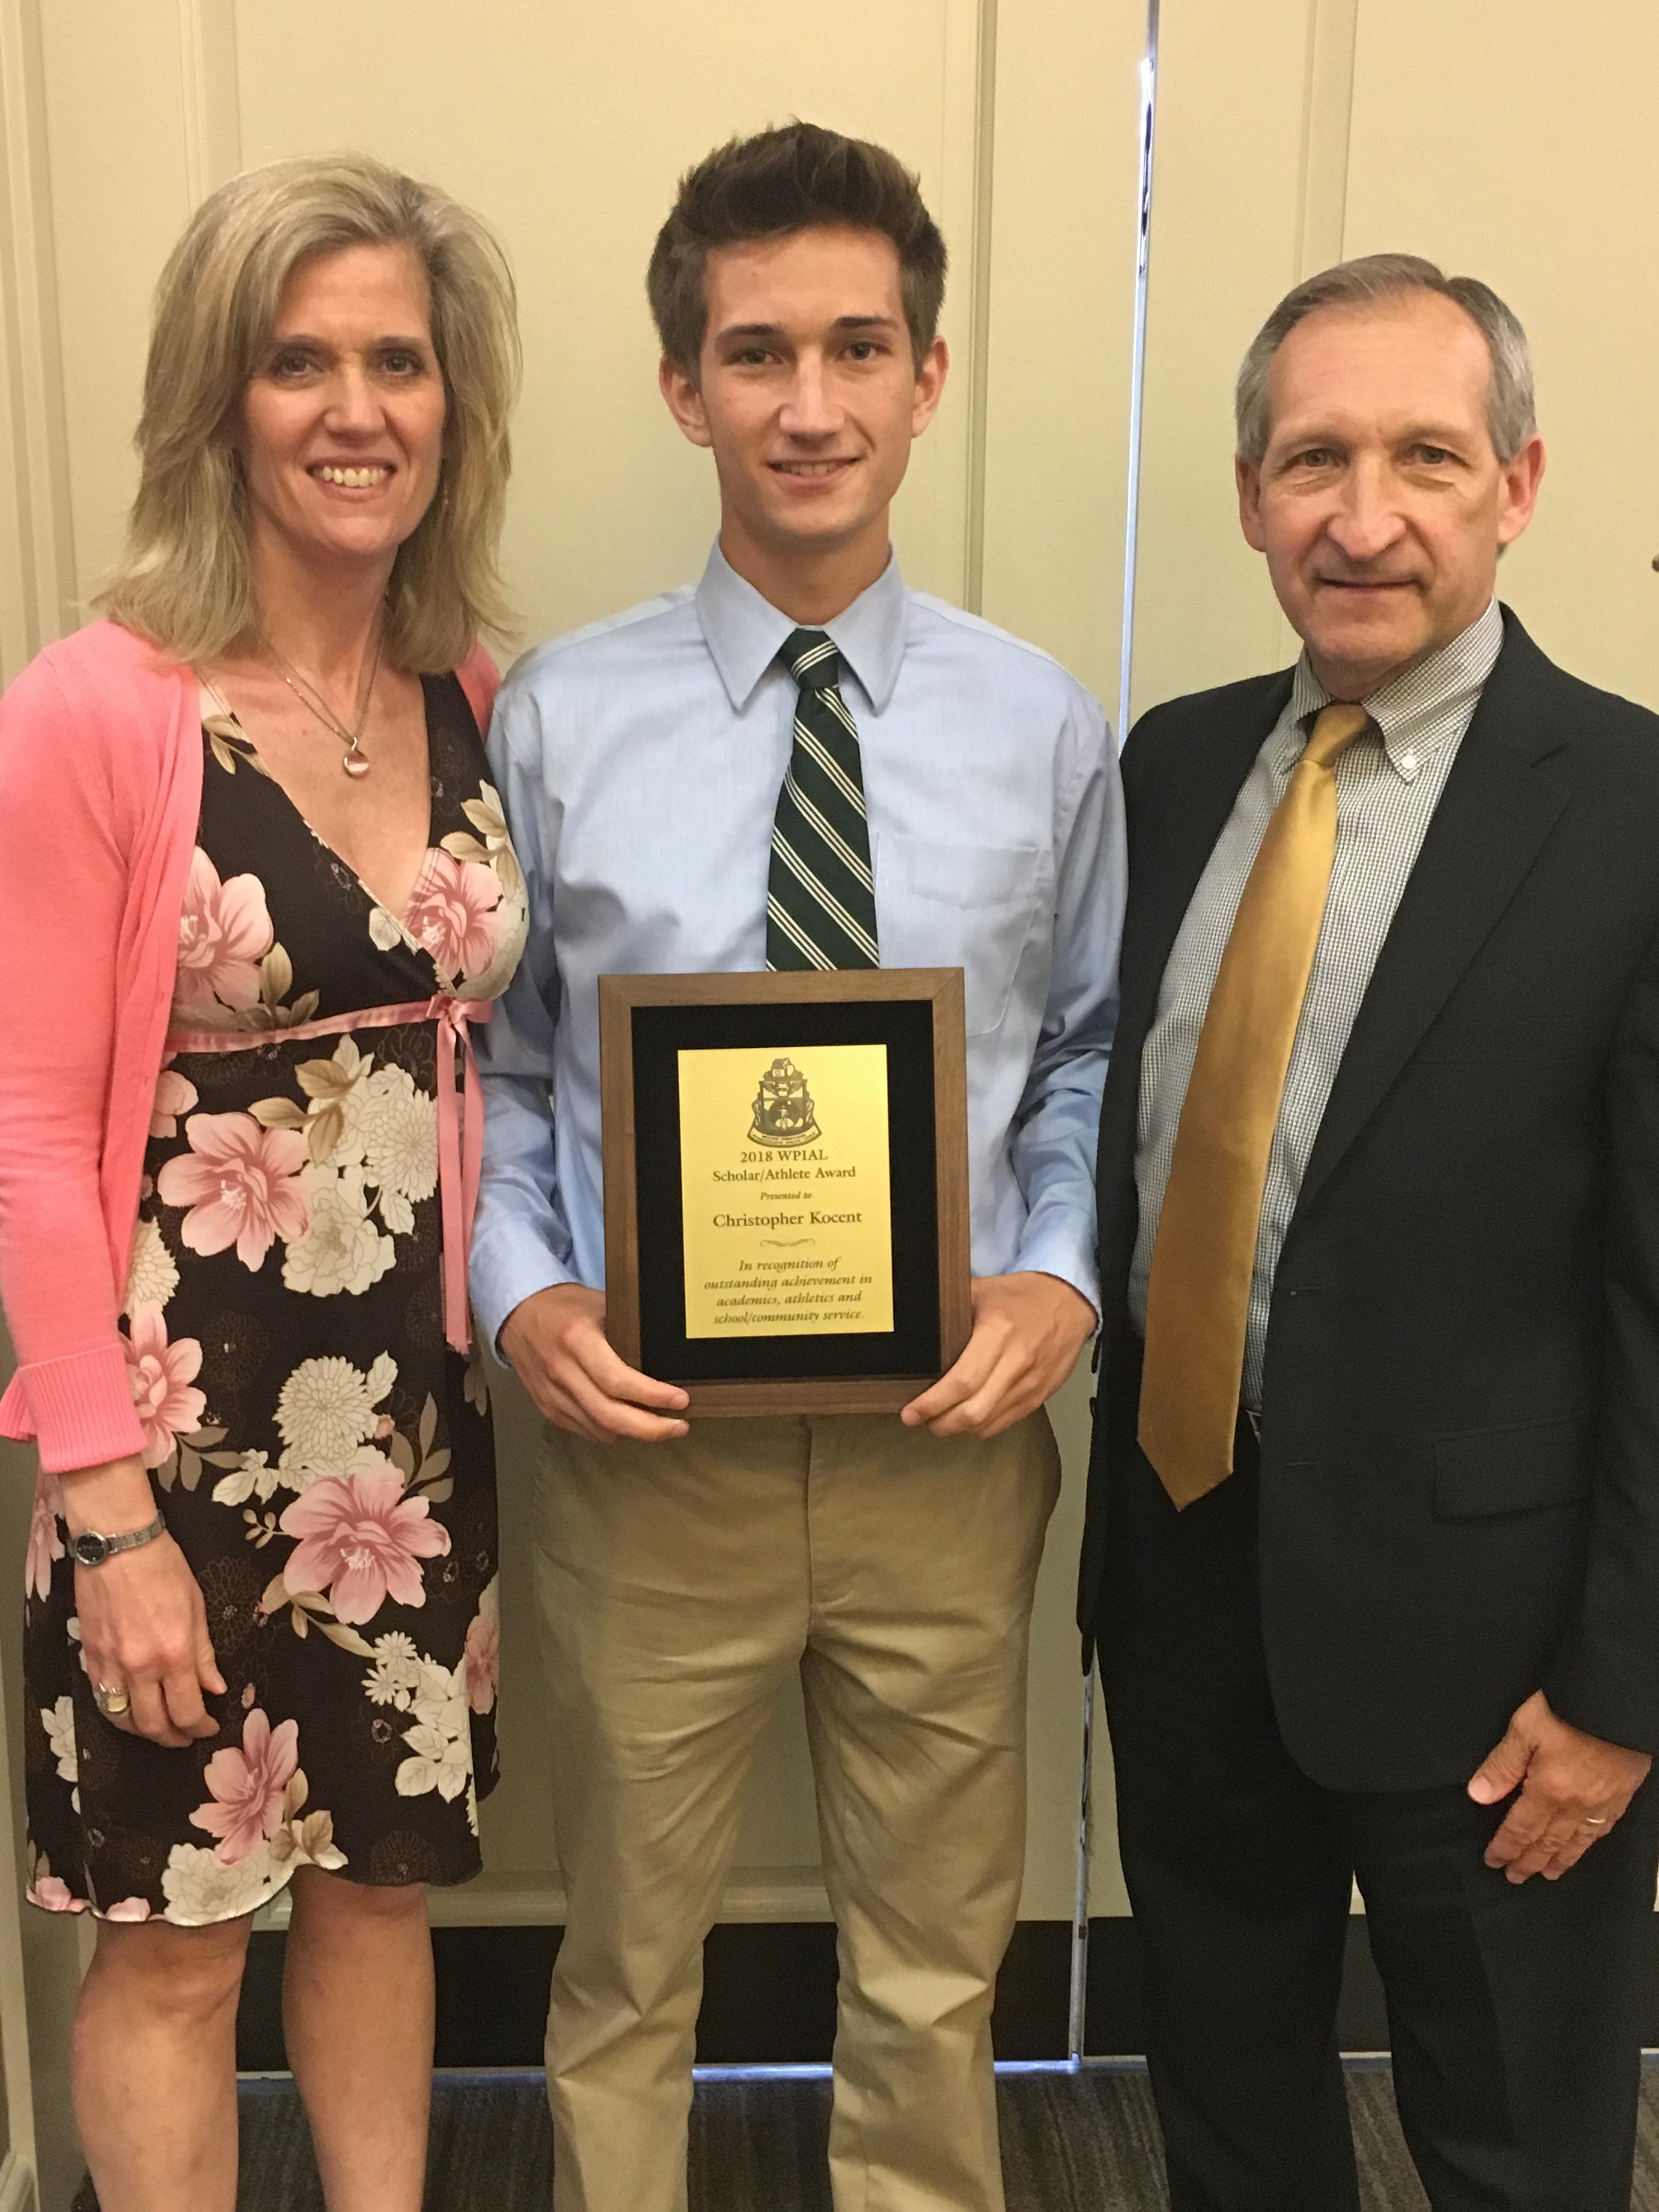 OLSH Senior Receives WPIAL Scholar-Athlete Award